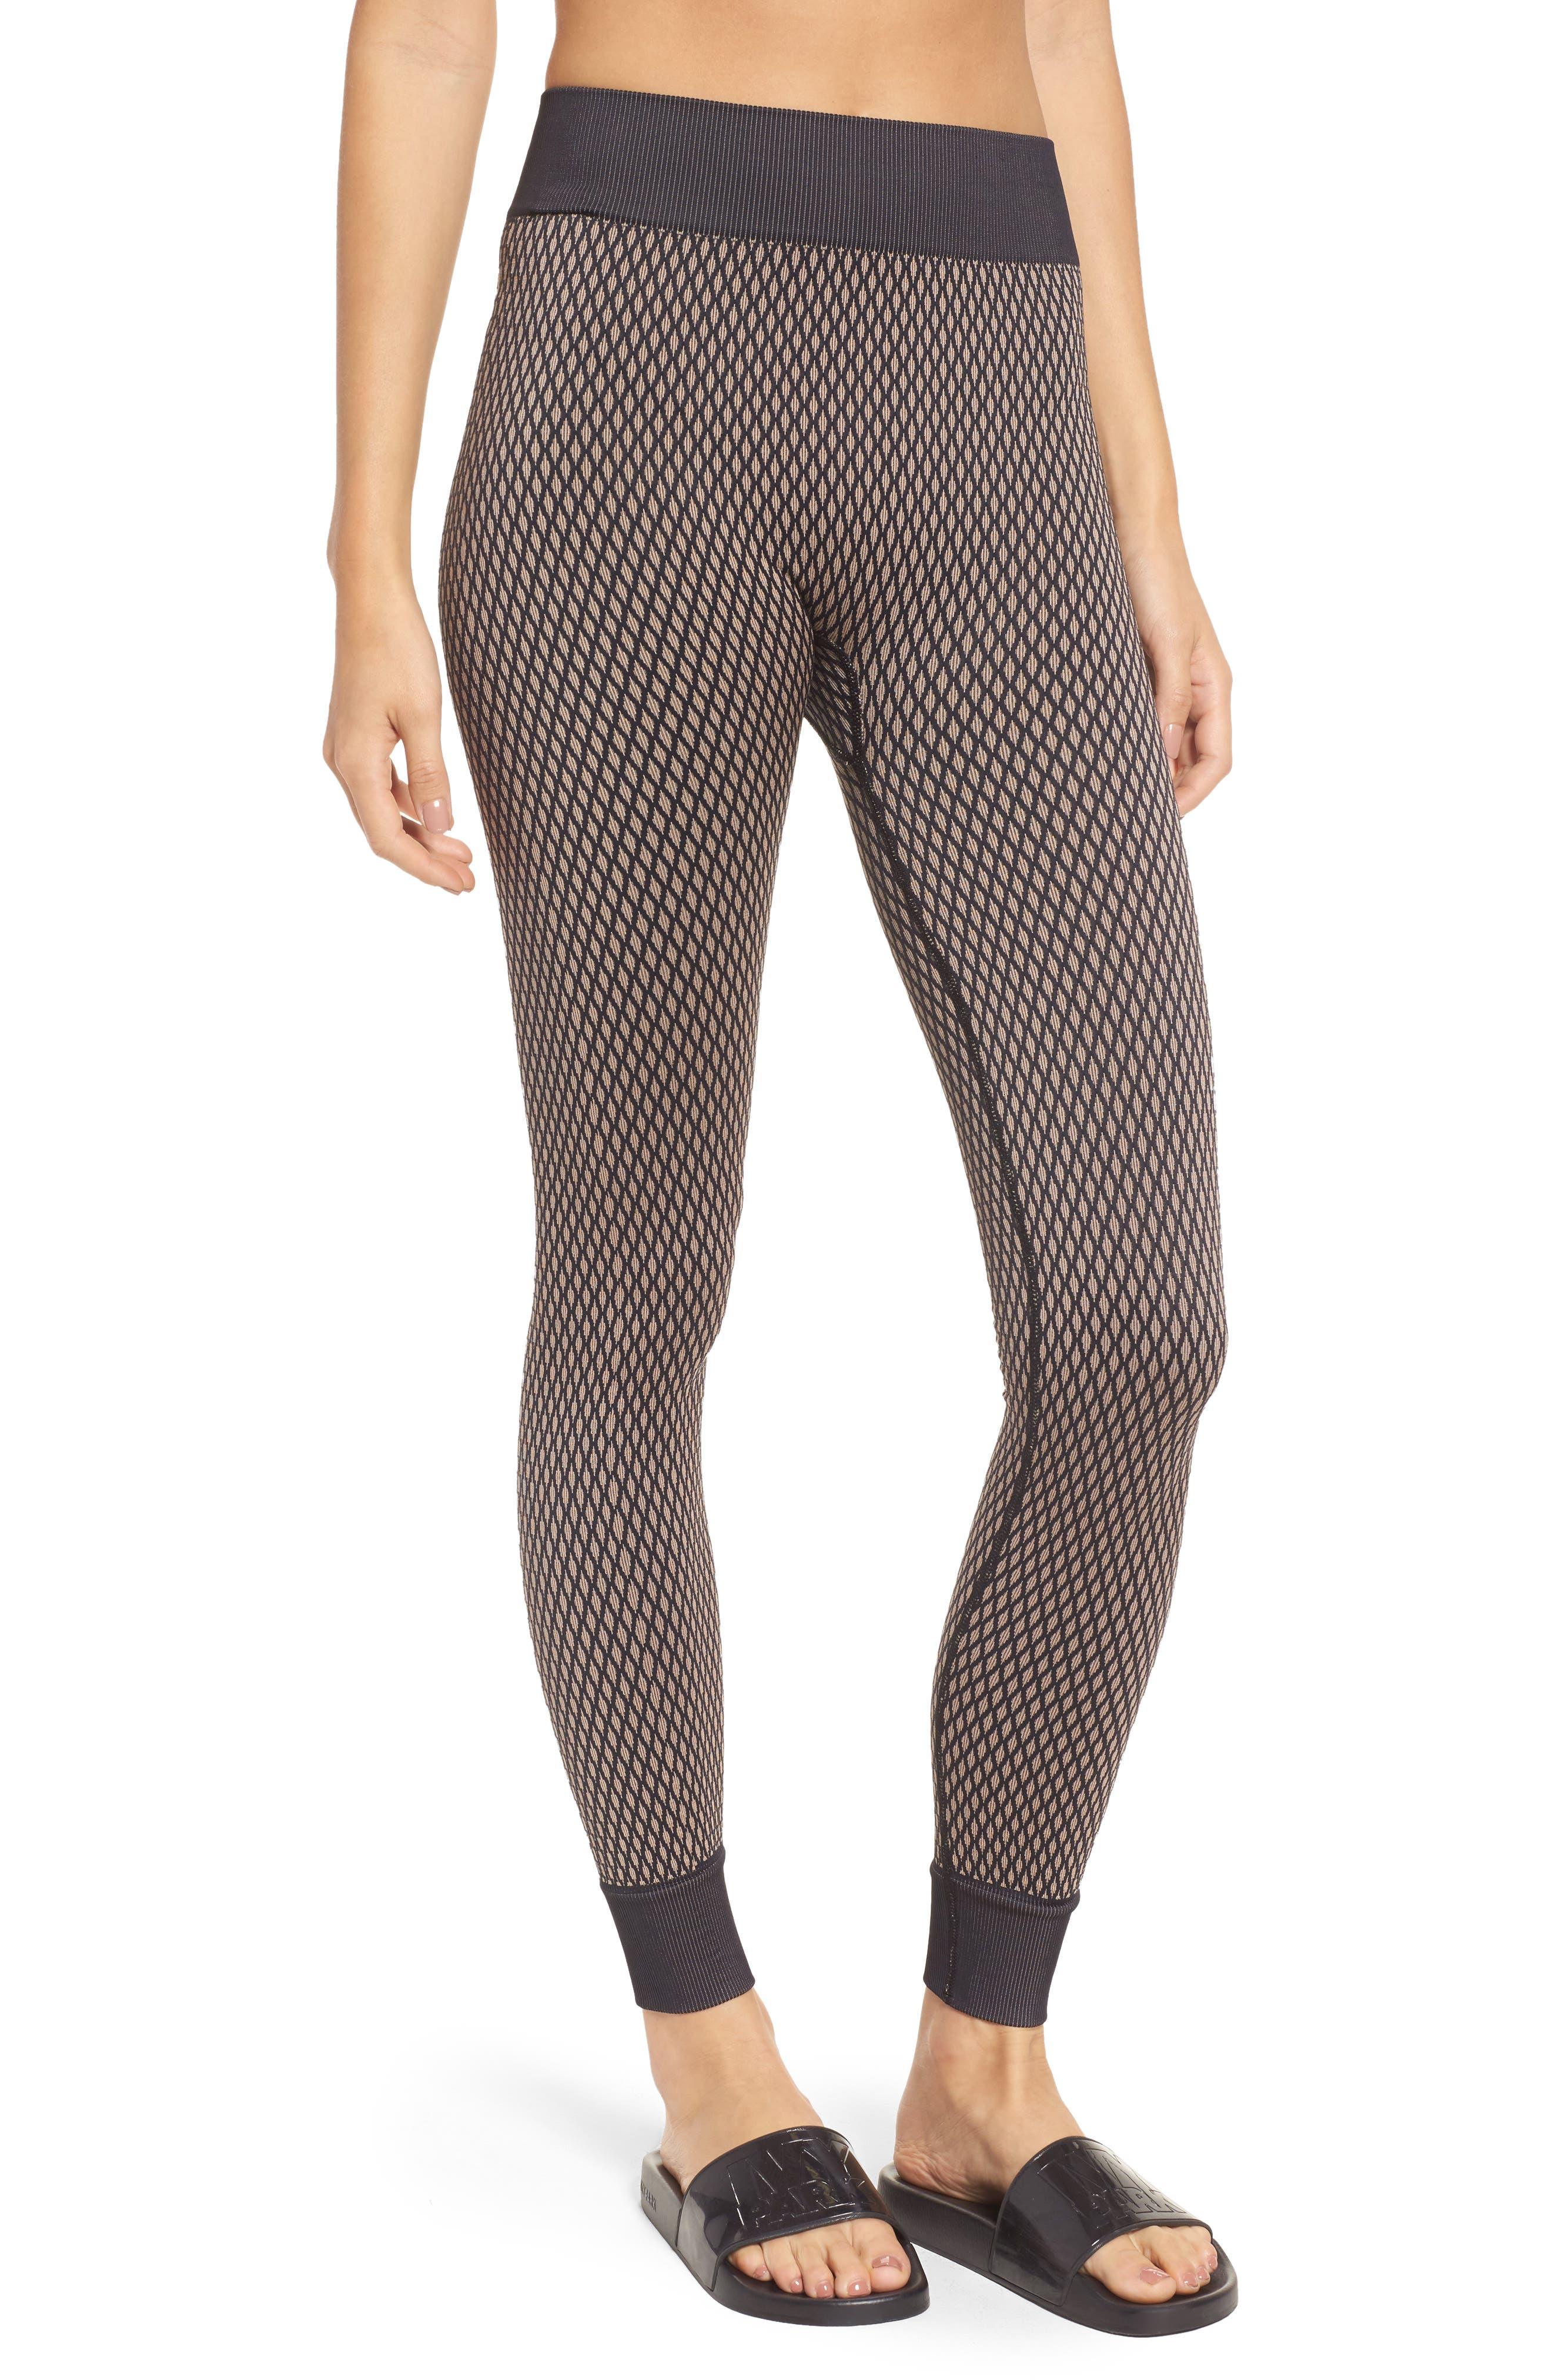 Fishnet Seamless Leggings,                         Main,                         color, Black